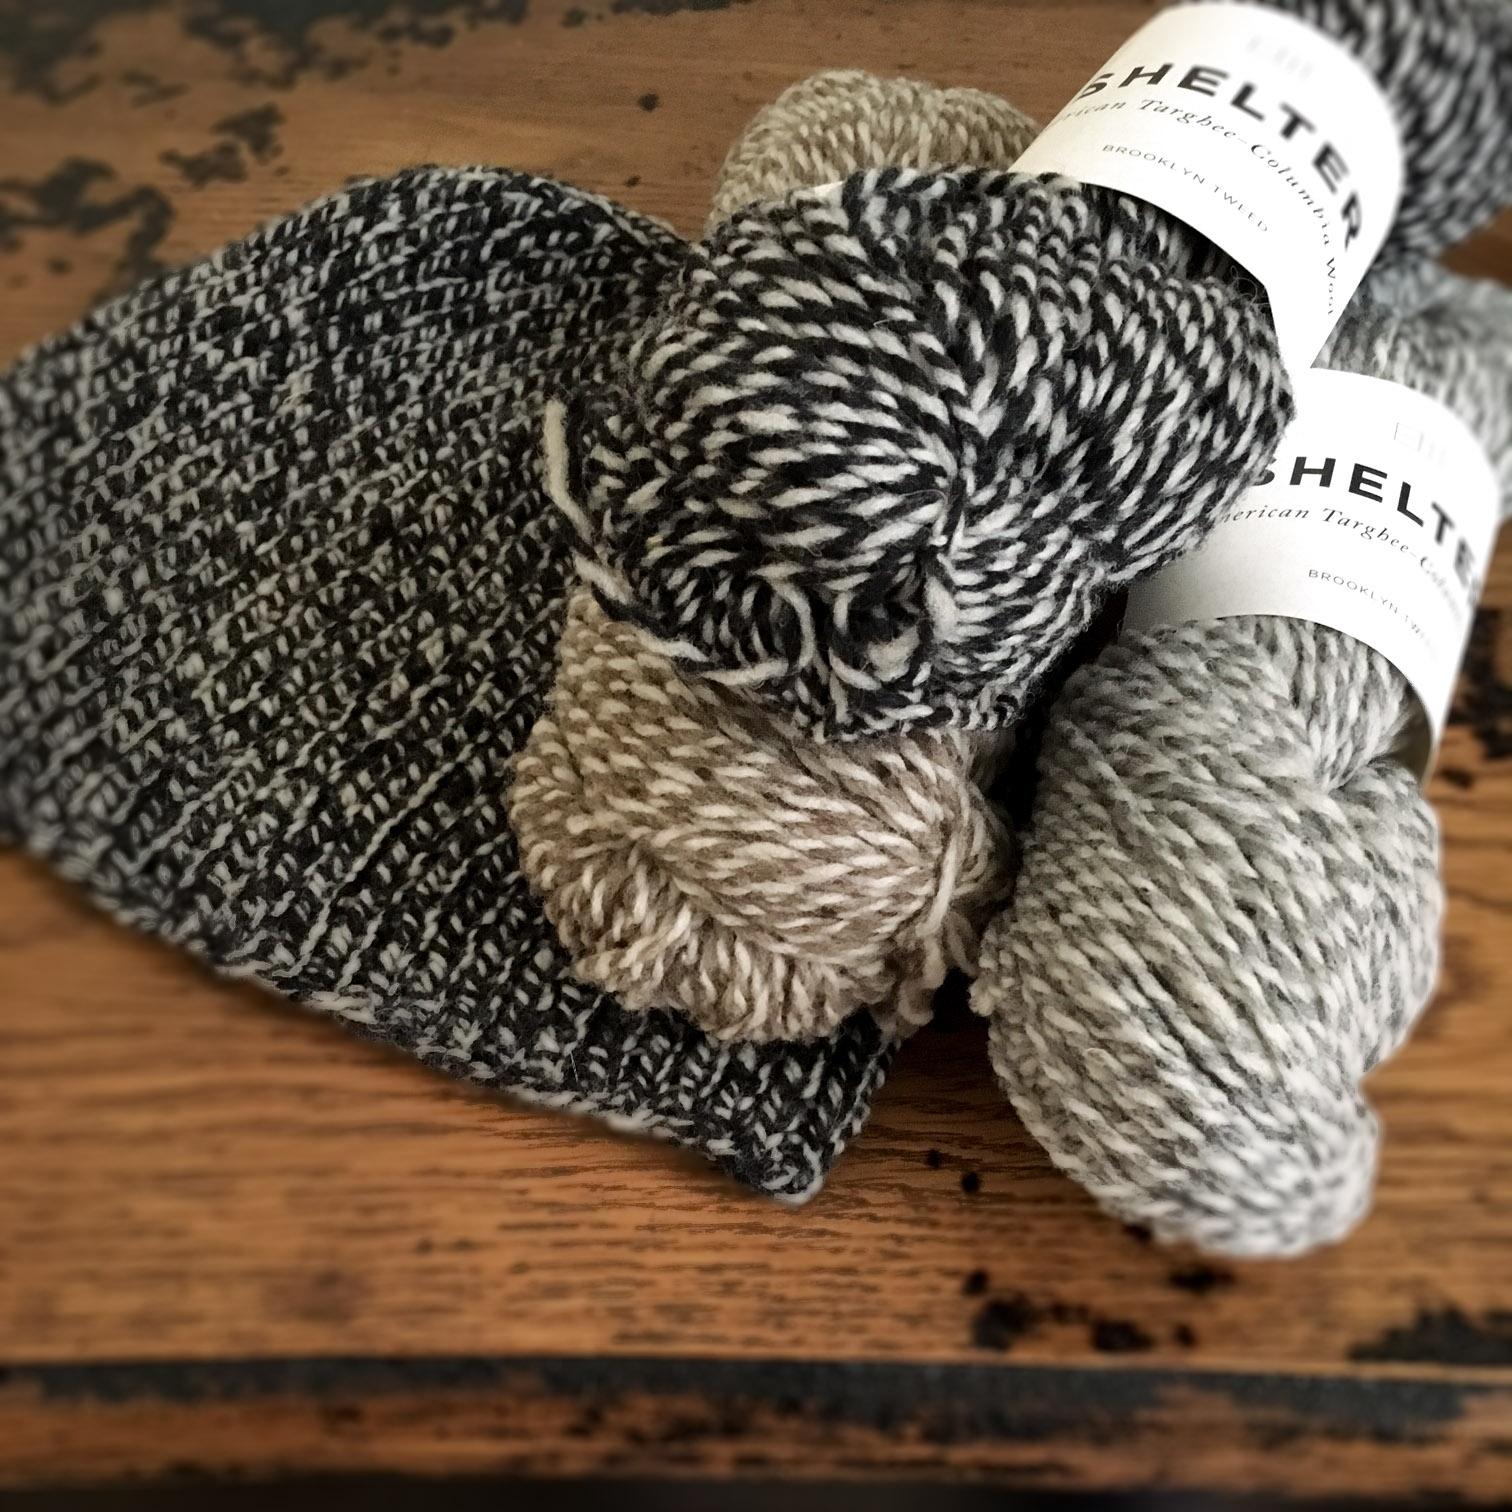 Introducing: Shelter Marls by Brooklyn Tweed